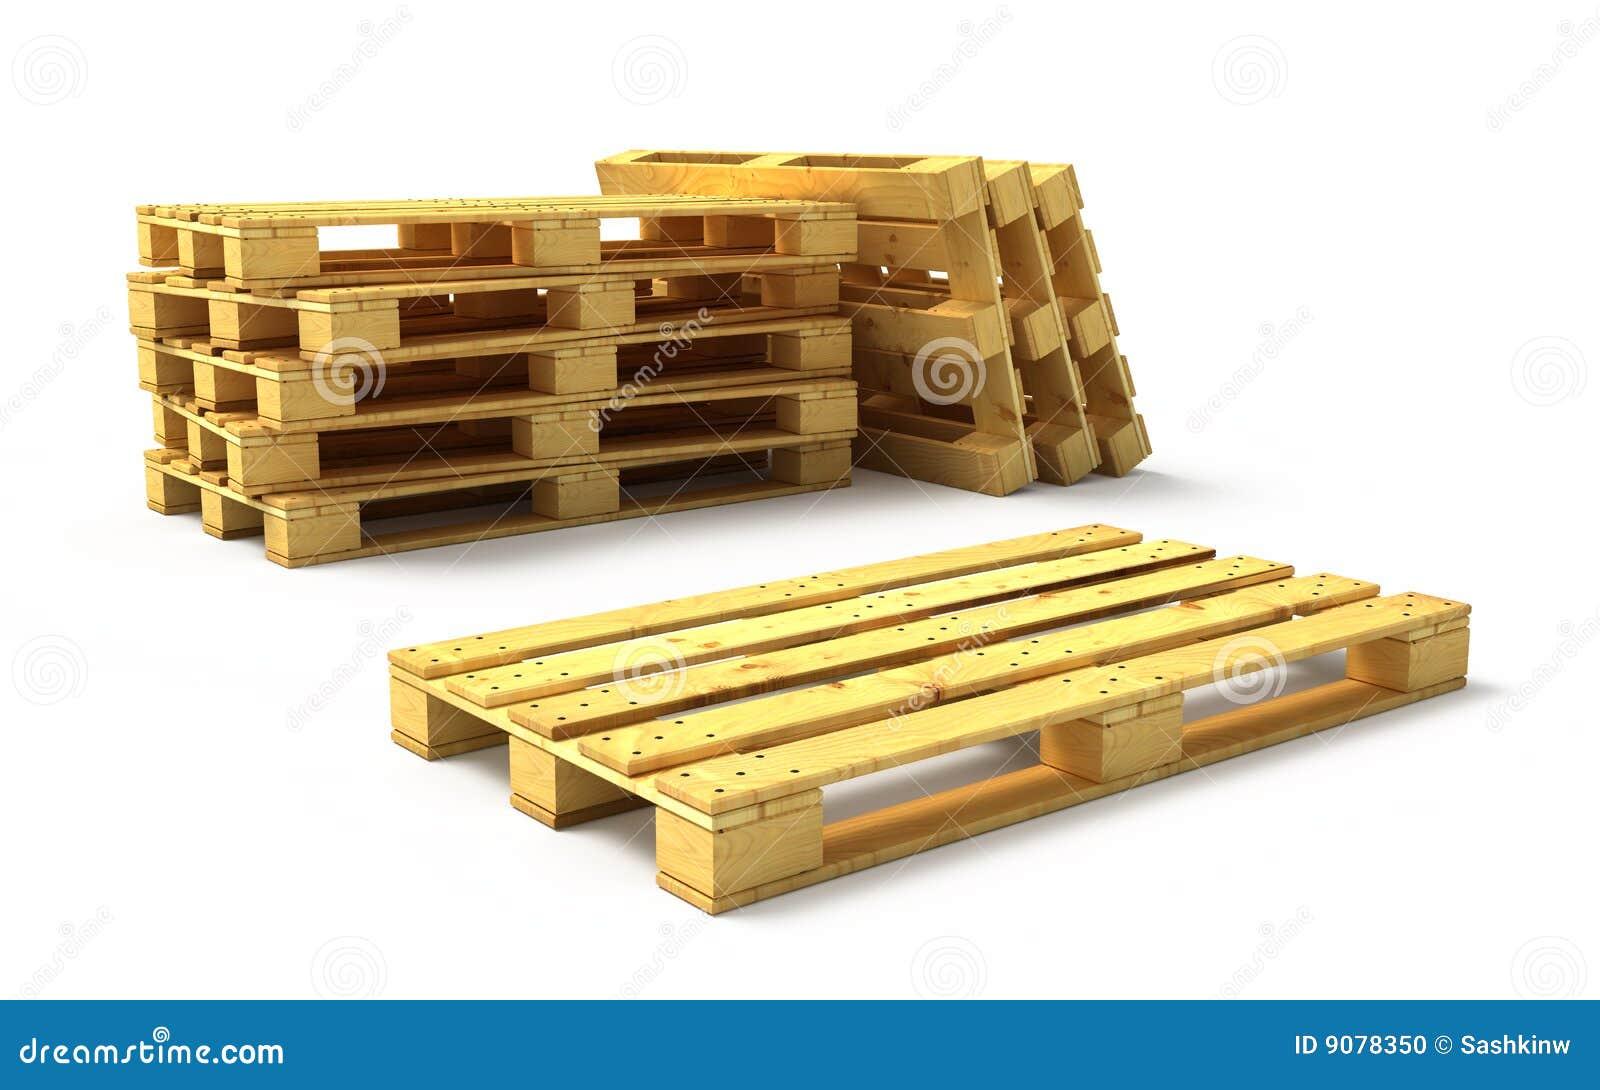 Wooden pallets stock illustration. Illustration of depot ...